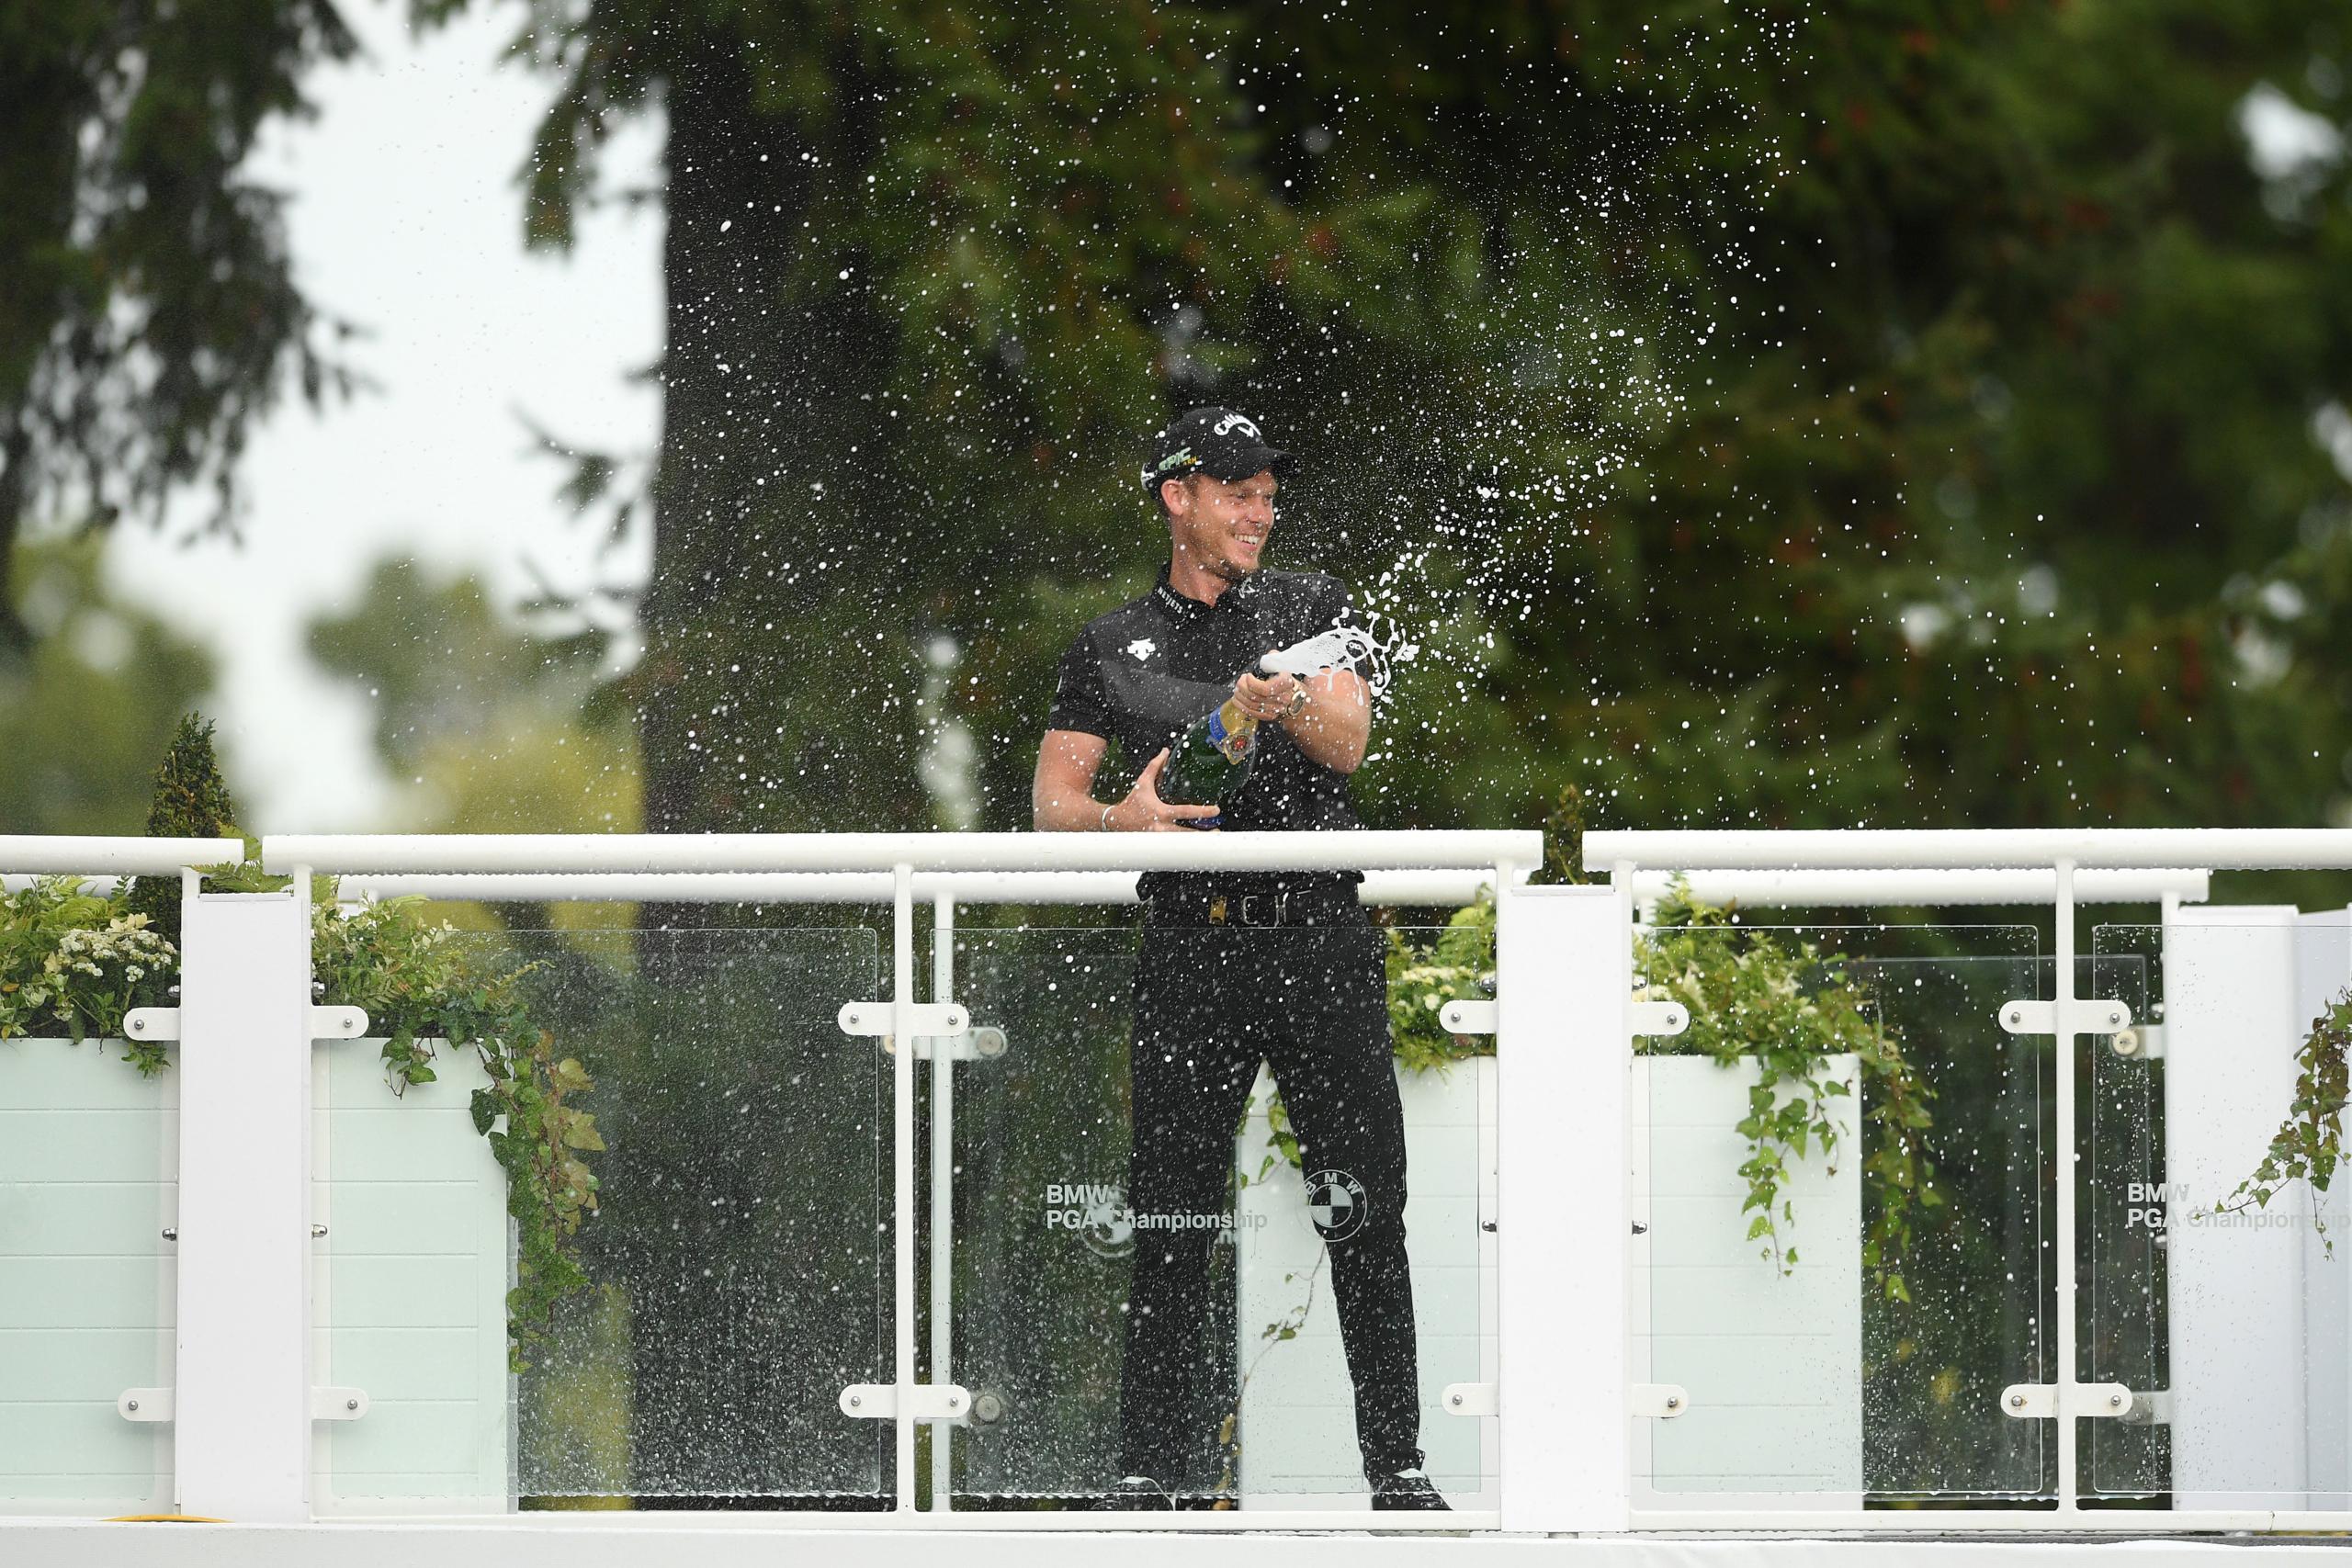 Danny Willett celebrating at the 2019 BMW PGA Championship